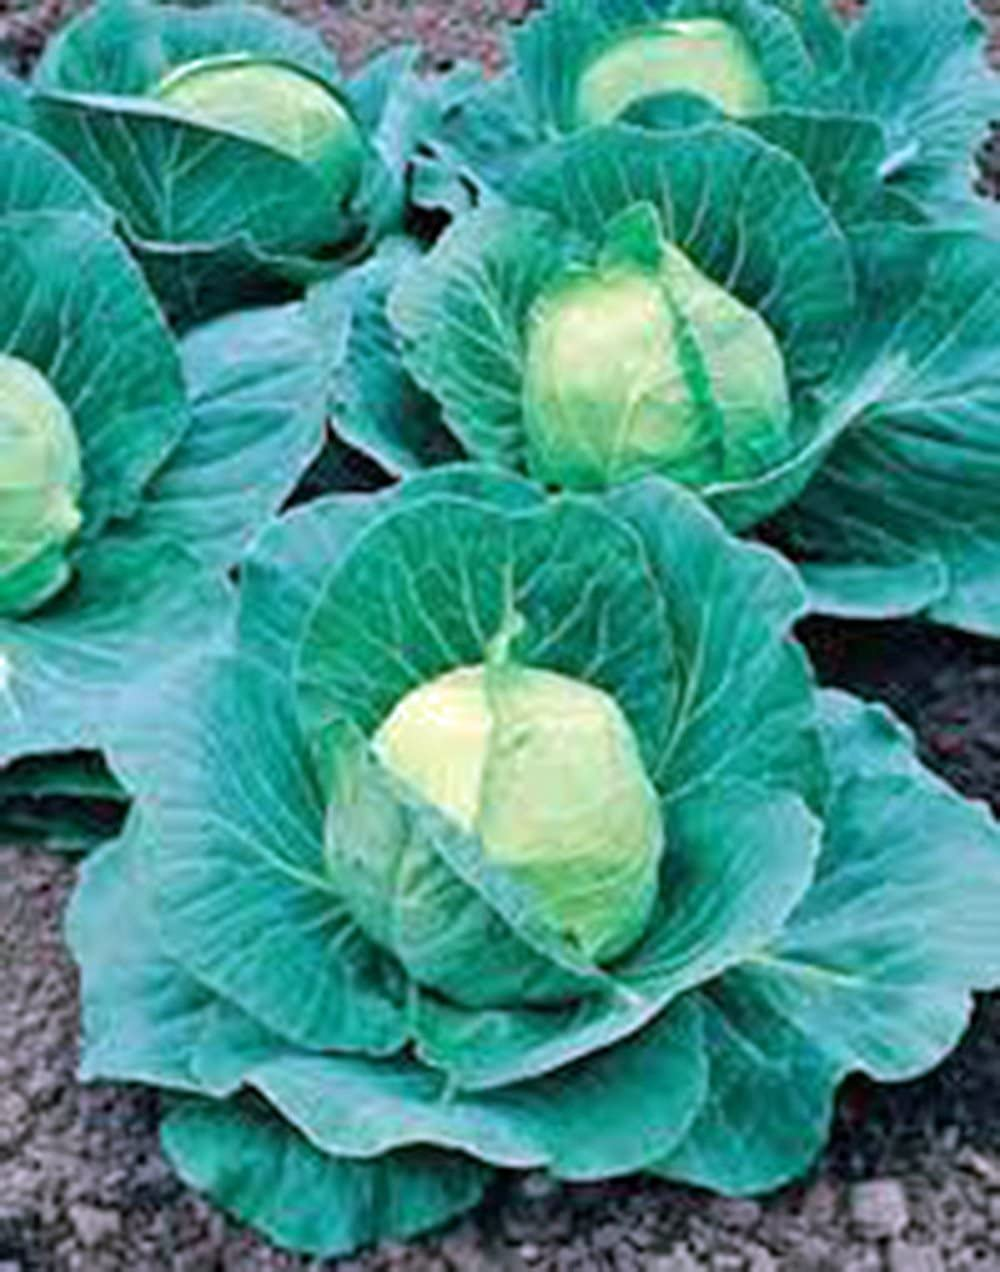 Cabbage Seed, Golden Acre, Heirloom, Non GMO, 25 Seeds, Tasty Healthy Veggie